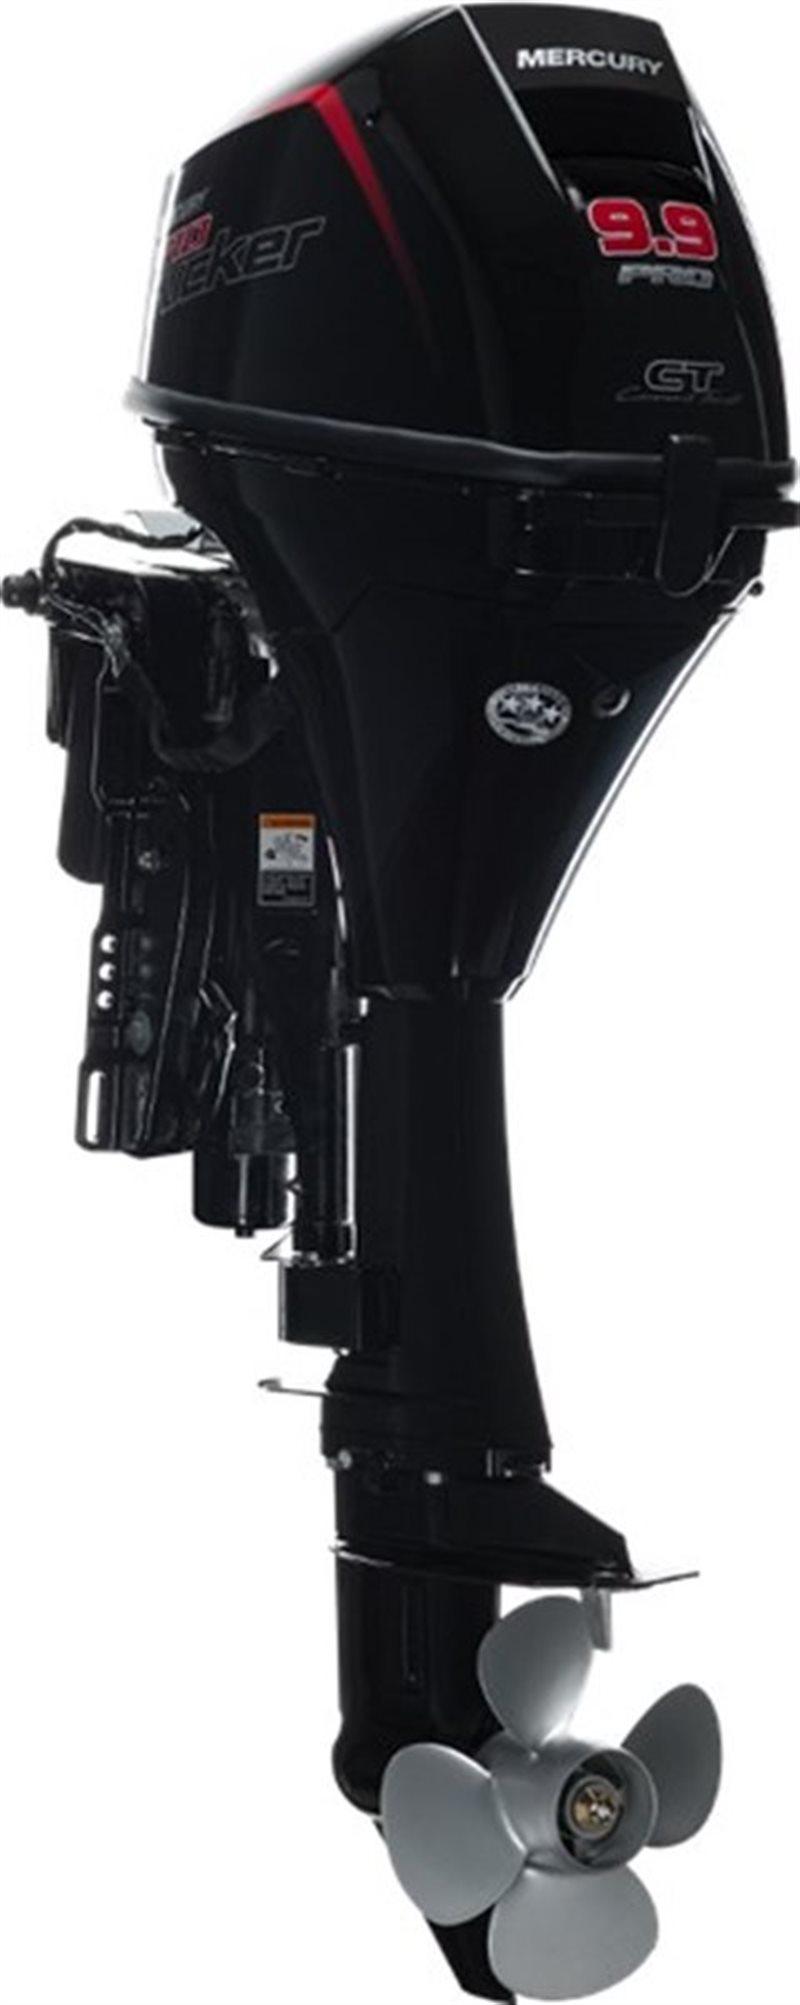 2021 Mercury Outboard FourStroke 8-9.9 hp 99 hp ProKicker at Pharo Marine, Waunakee, WI 53597